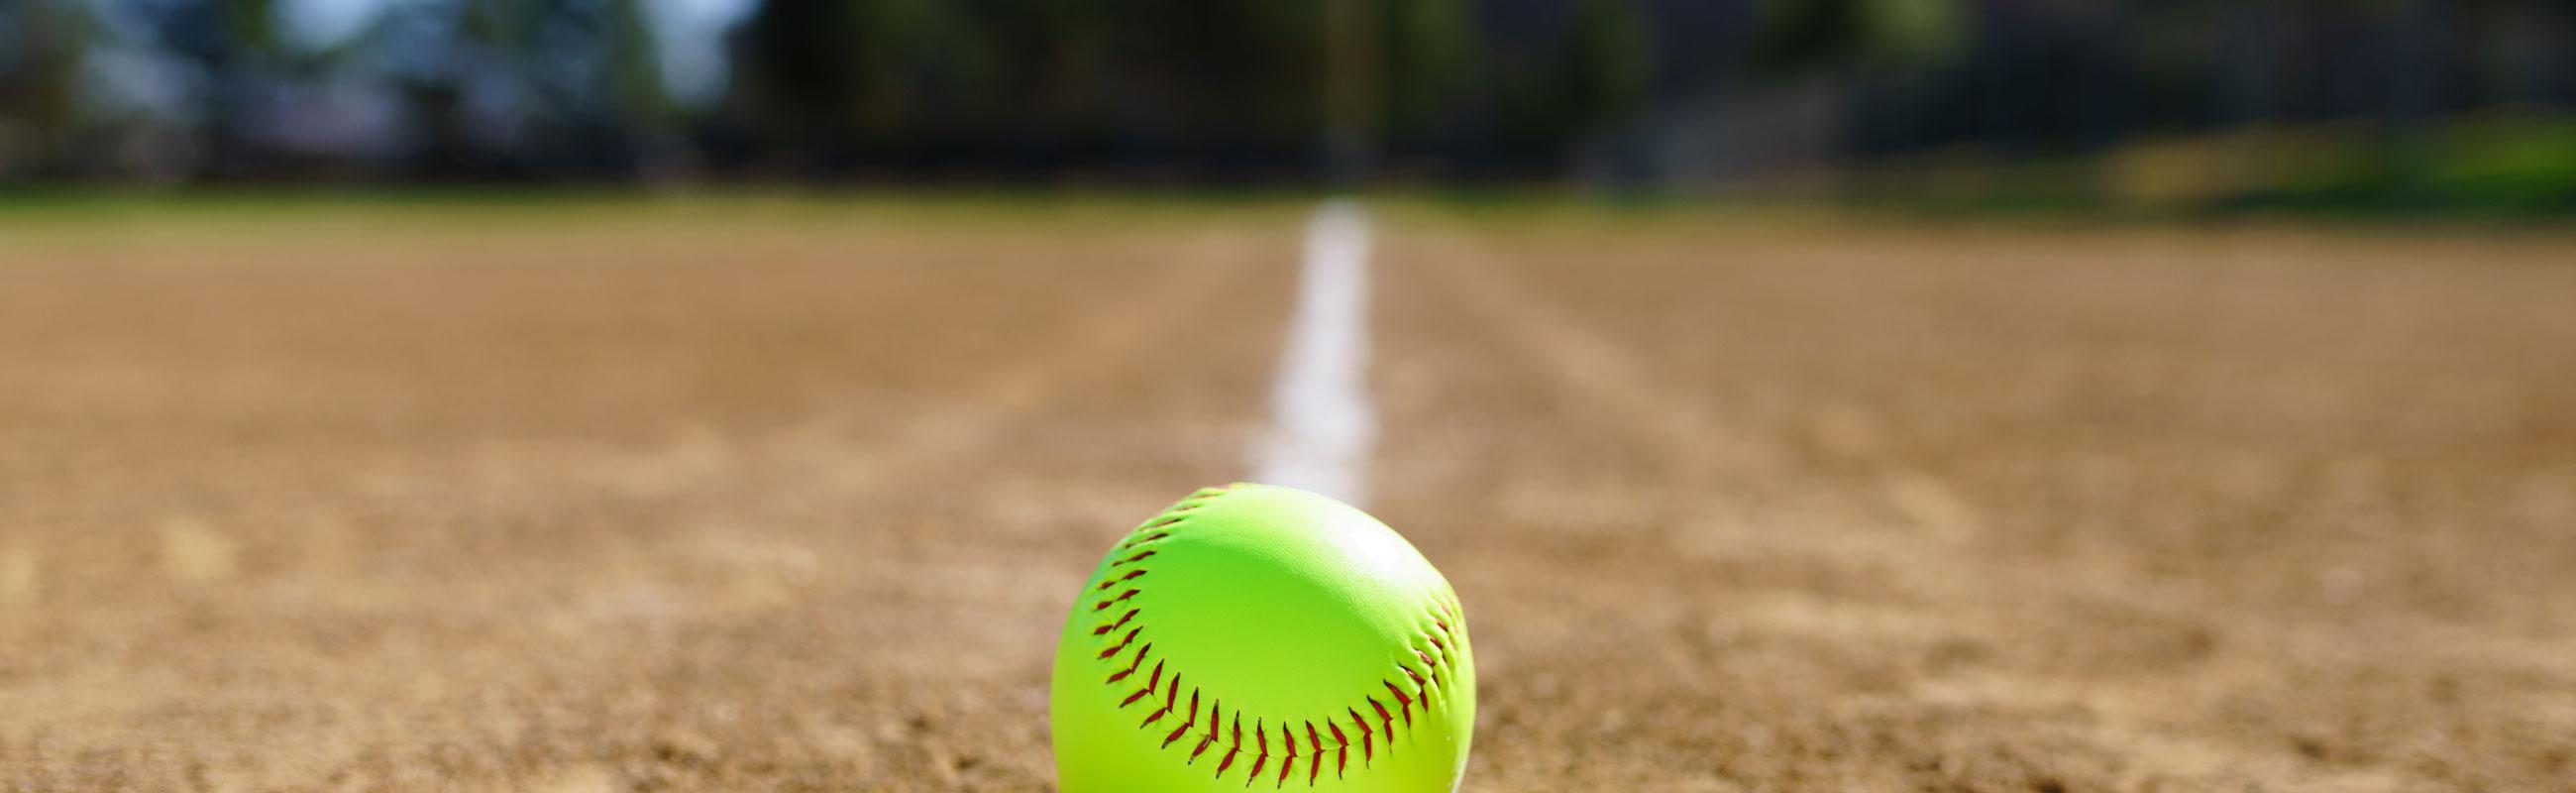 softball on the field